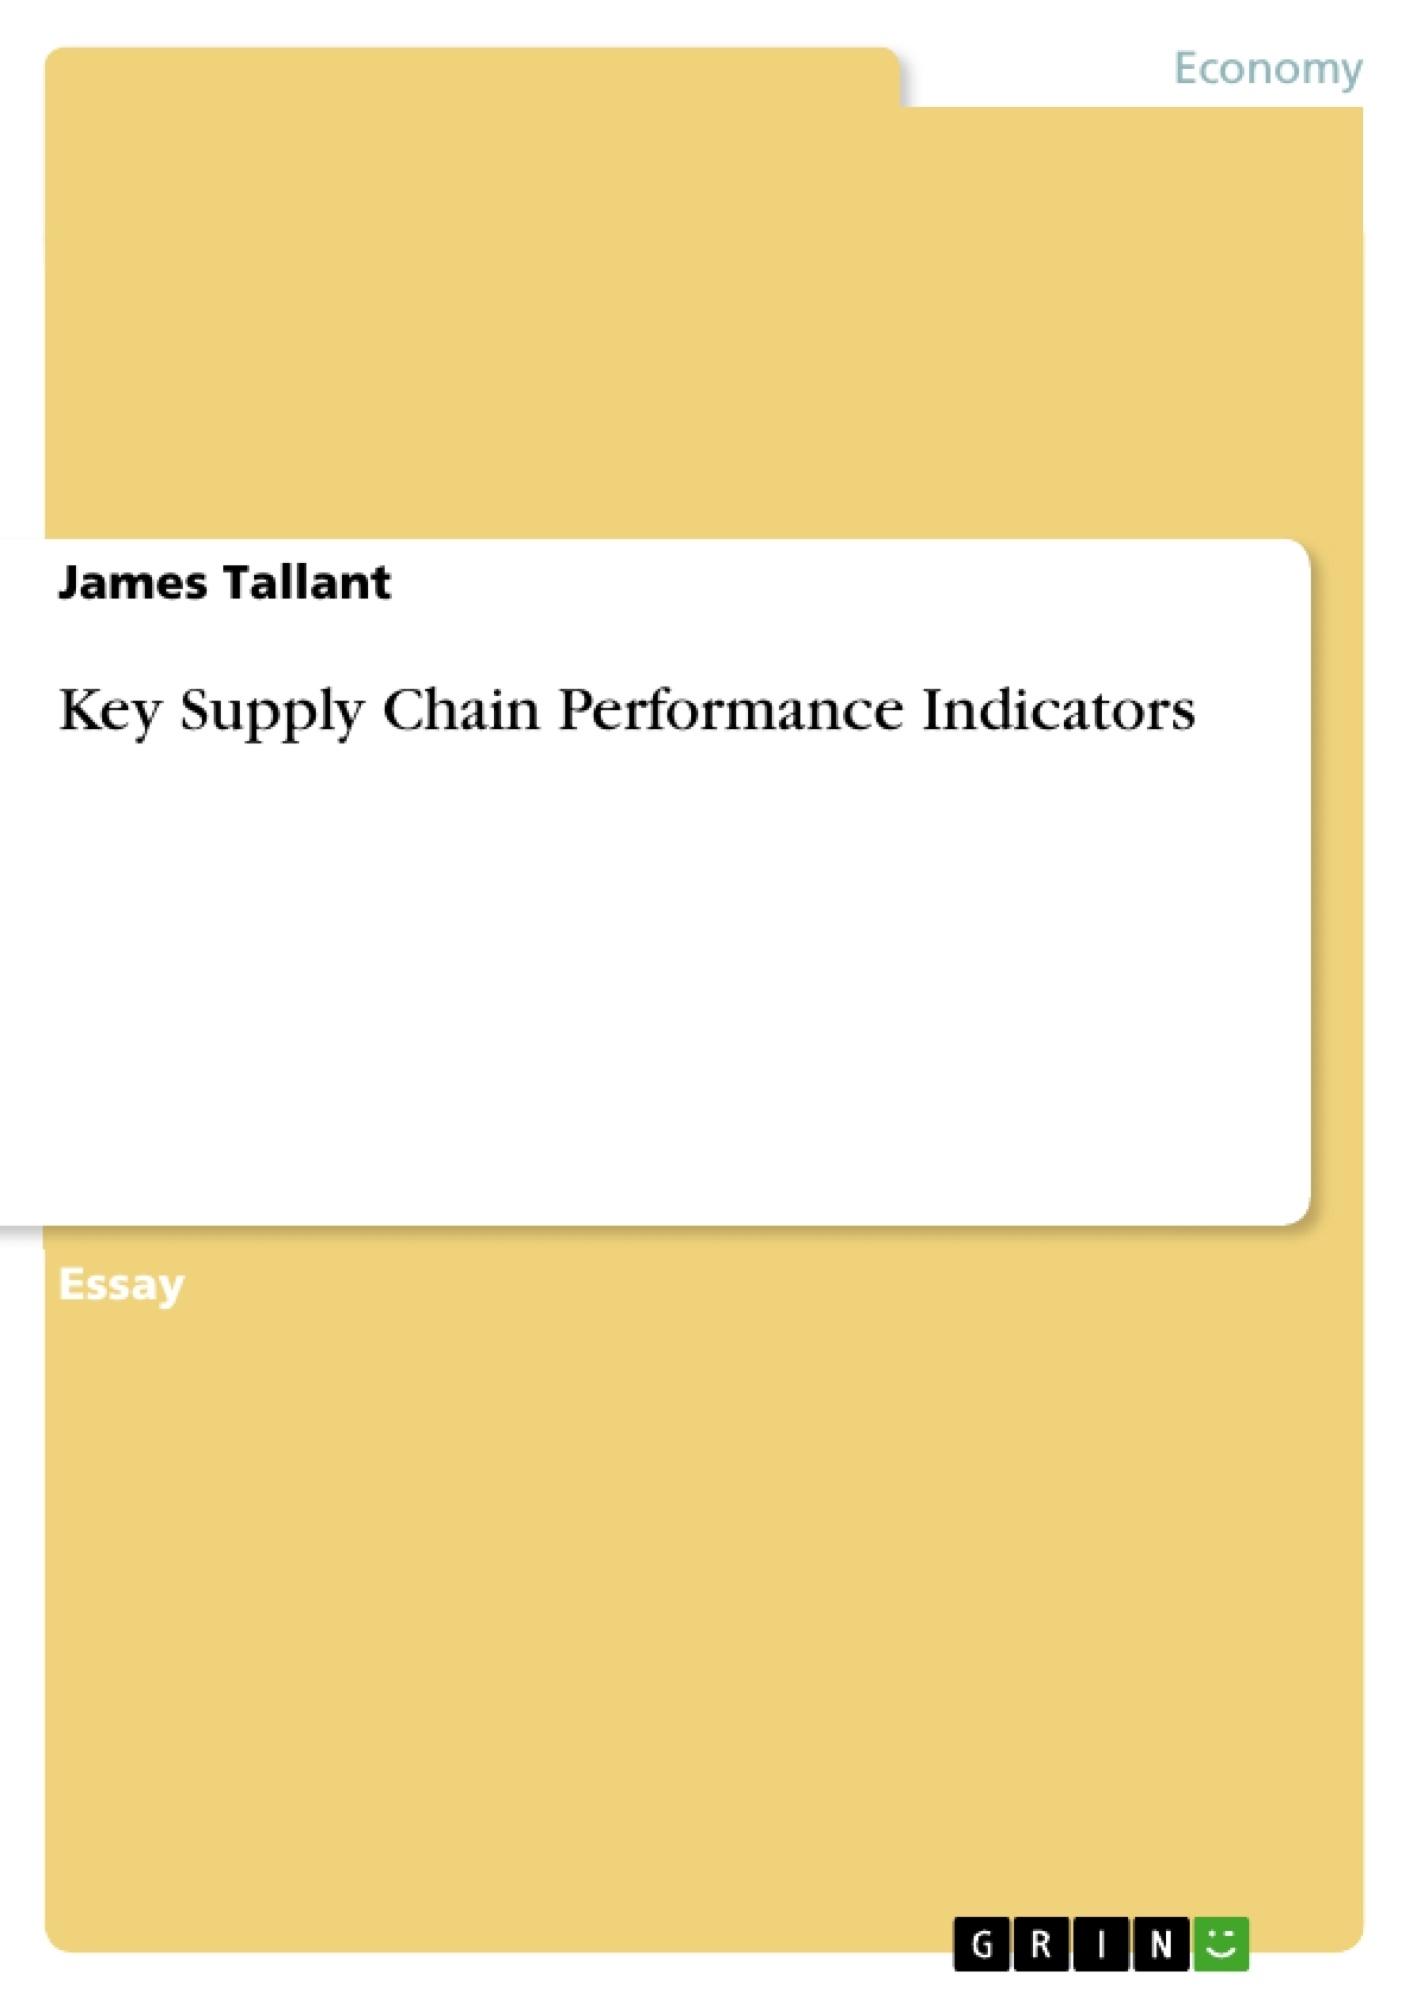 Title: Key Supply Chain Performance Indicators